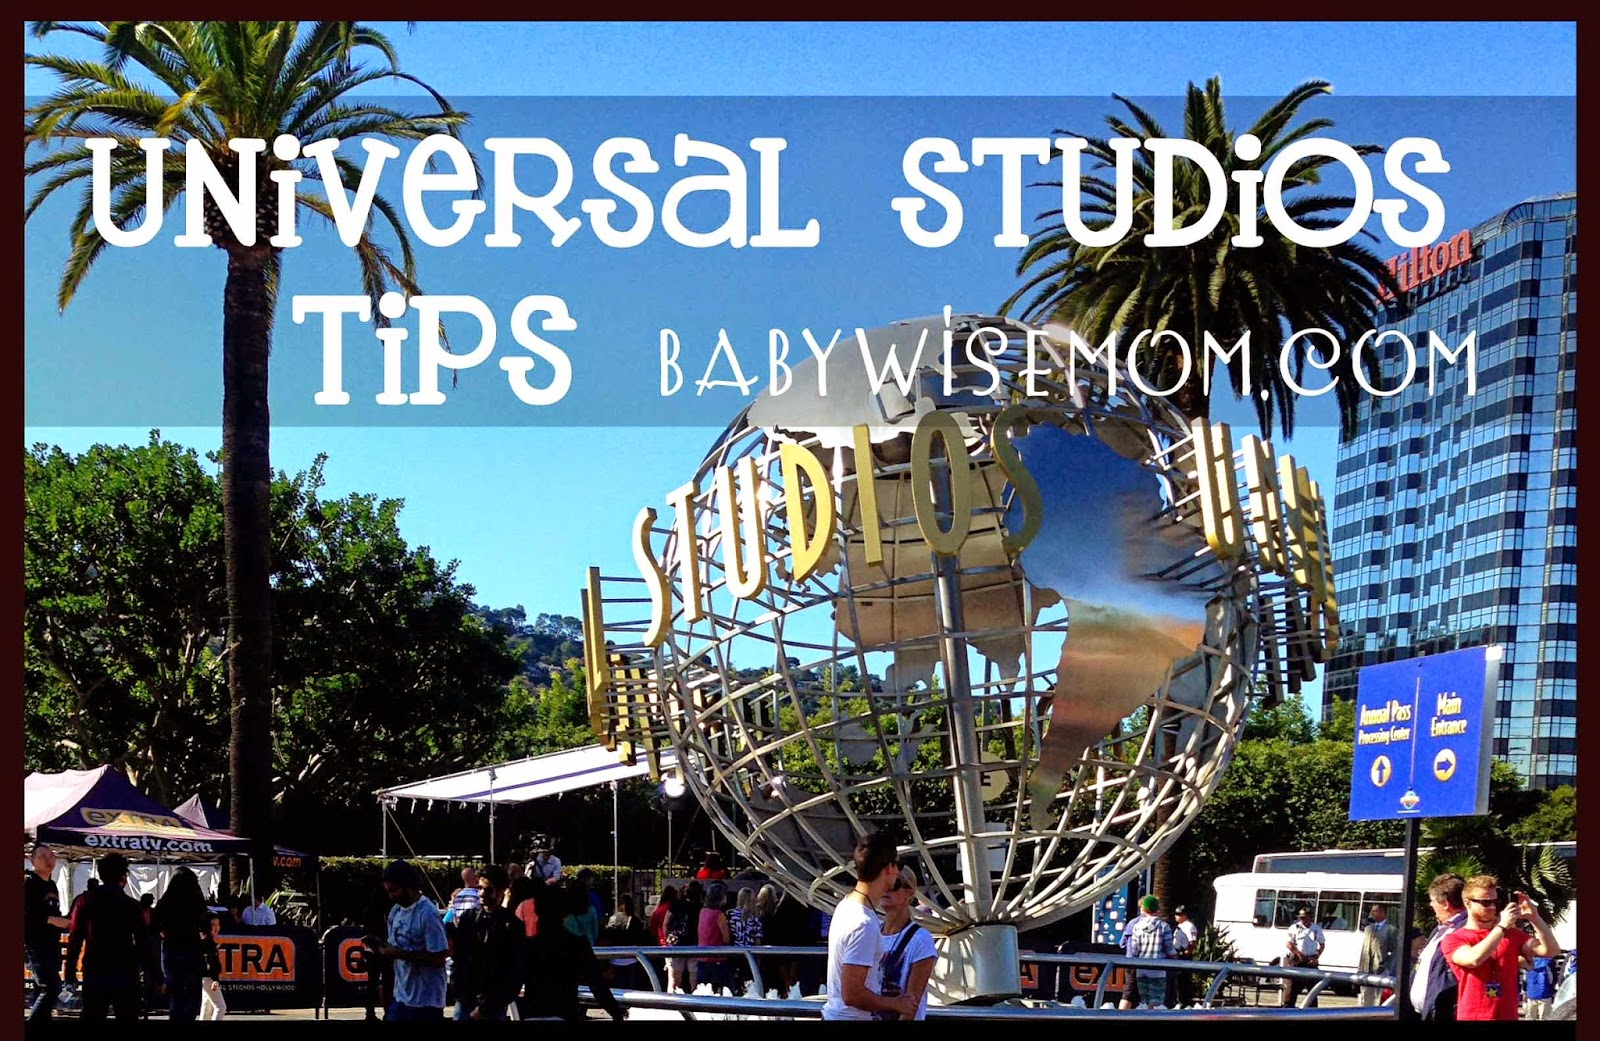 Universal Studios tips